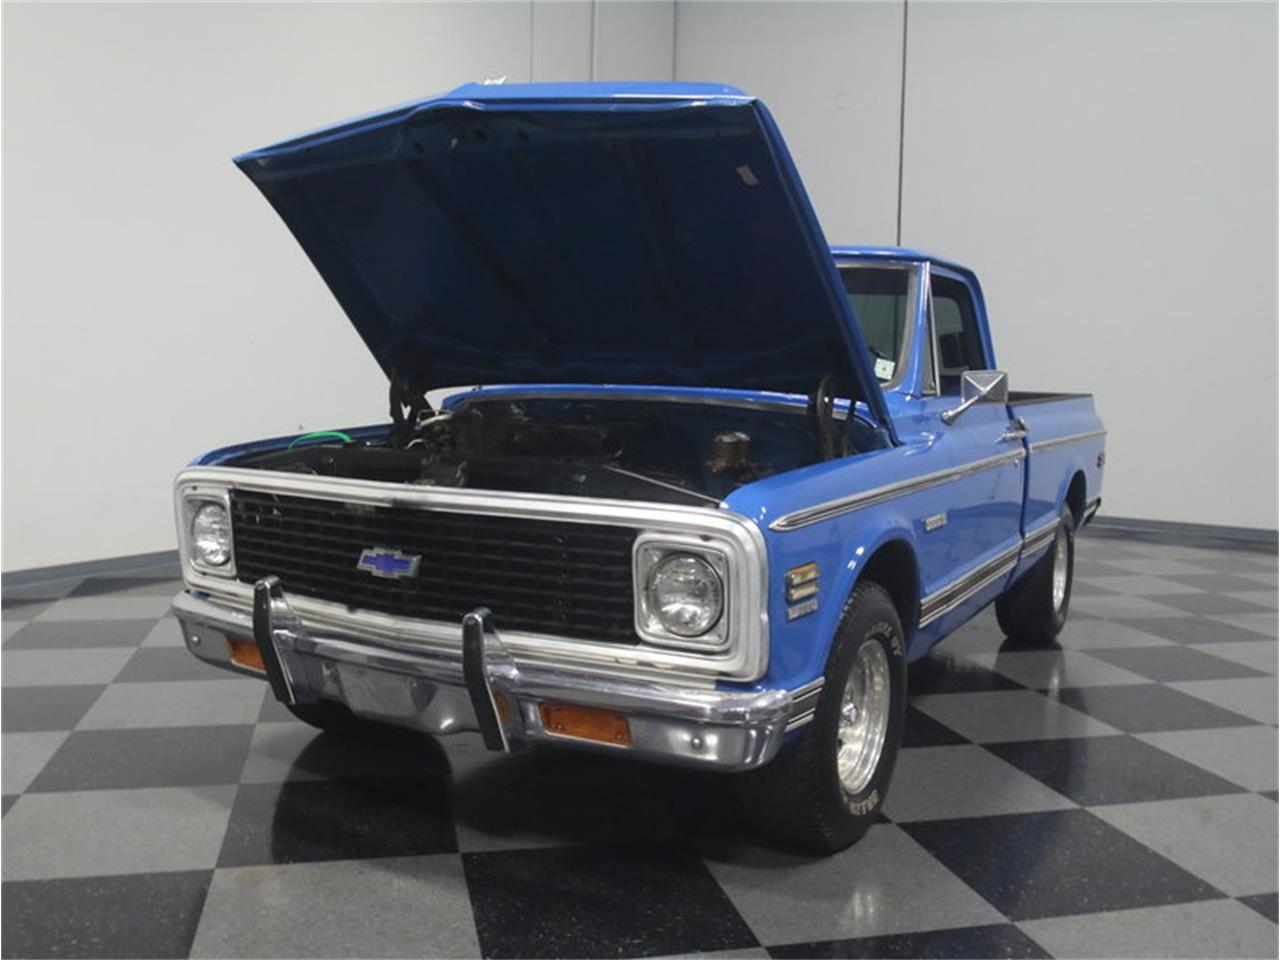 Large Picture of '71 Chevrolet C10 located in Georgia - $17,995.00 - LUZA